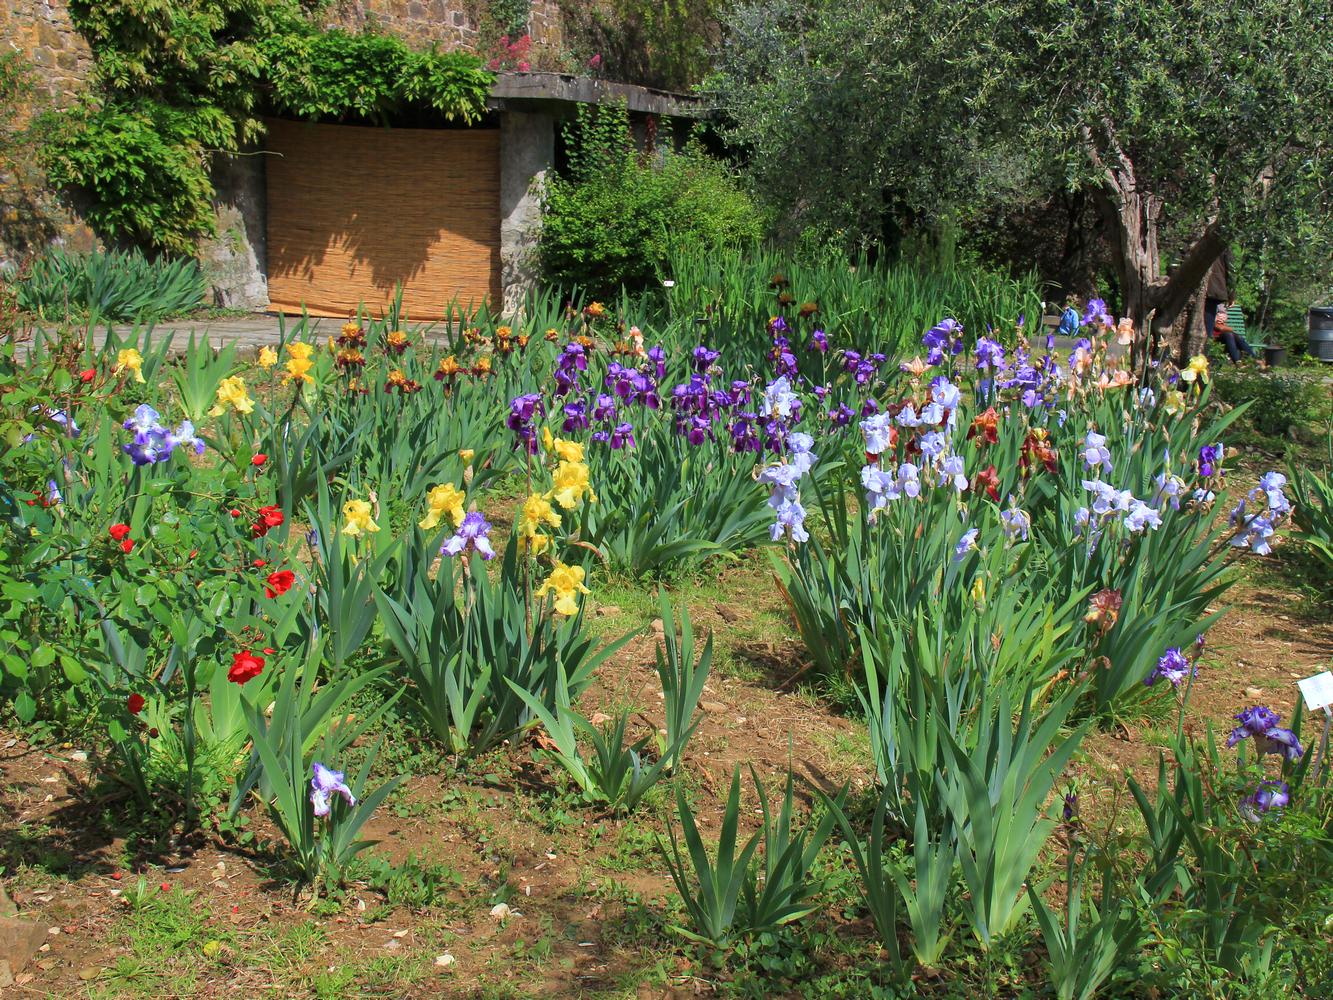 Il giardino dell iris firenze notizie - Giardino dell iris firenze ...